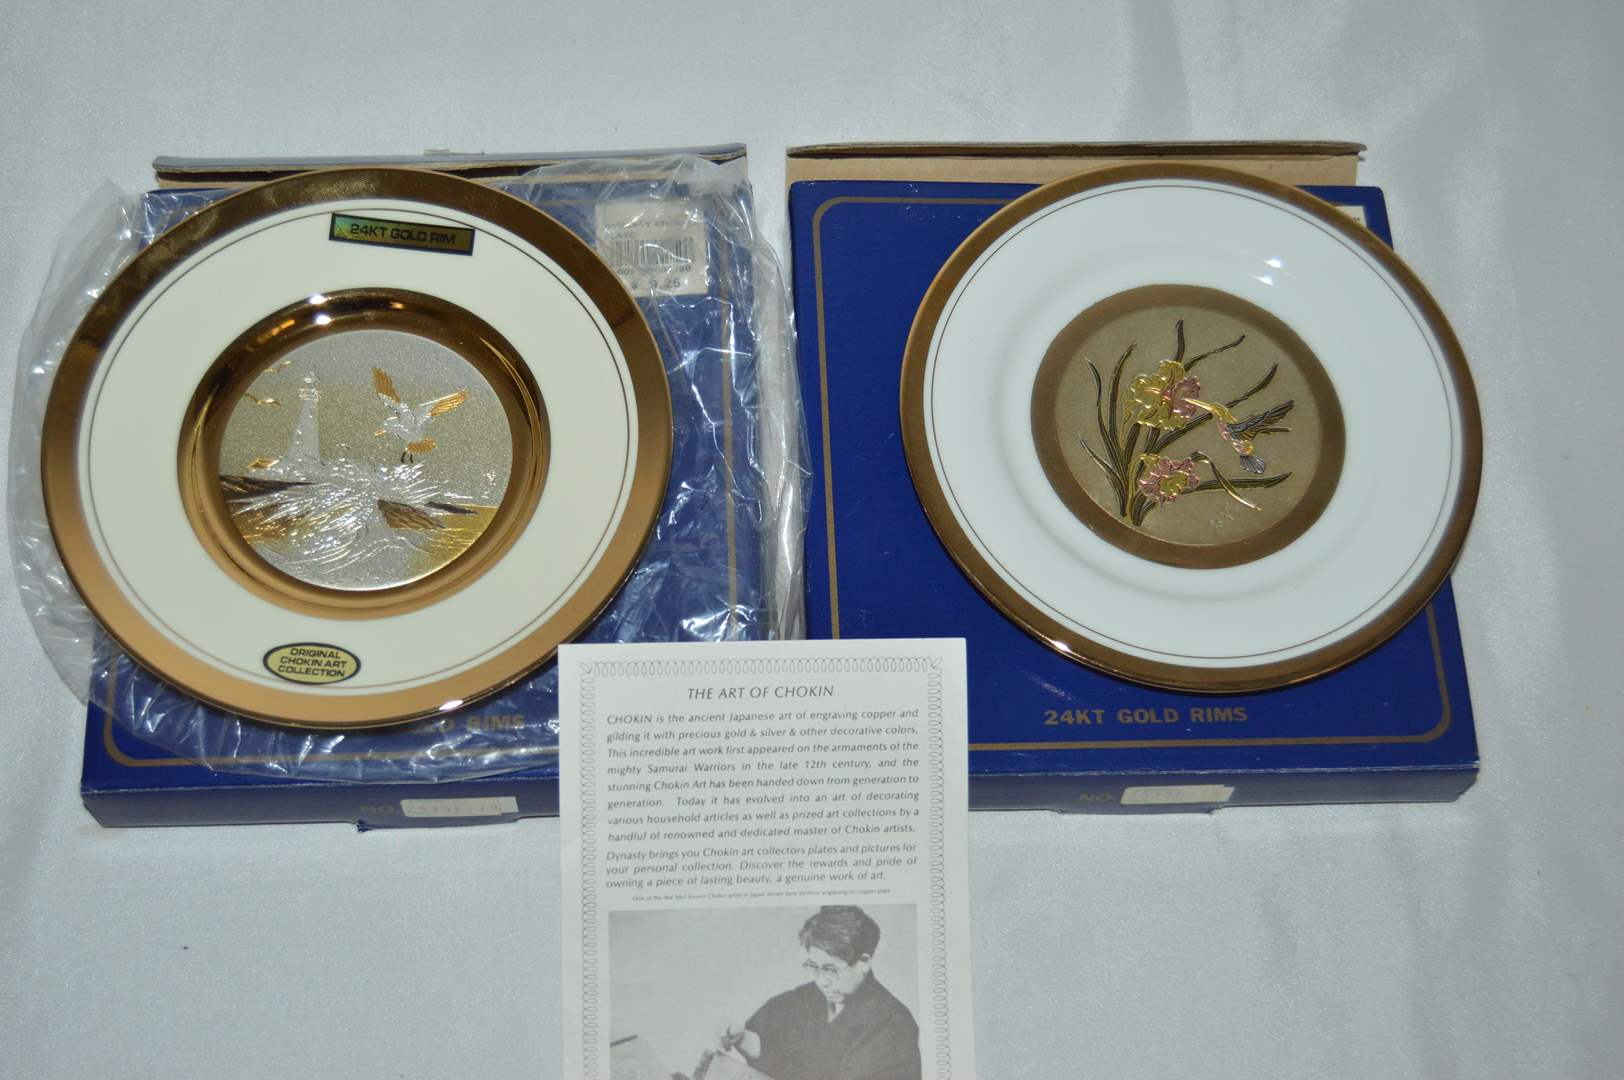 Lot # 145 2 Chokin plates with 24kt gold rim (main image)